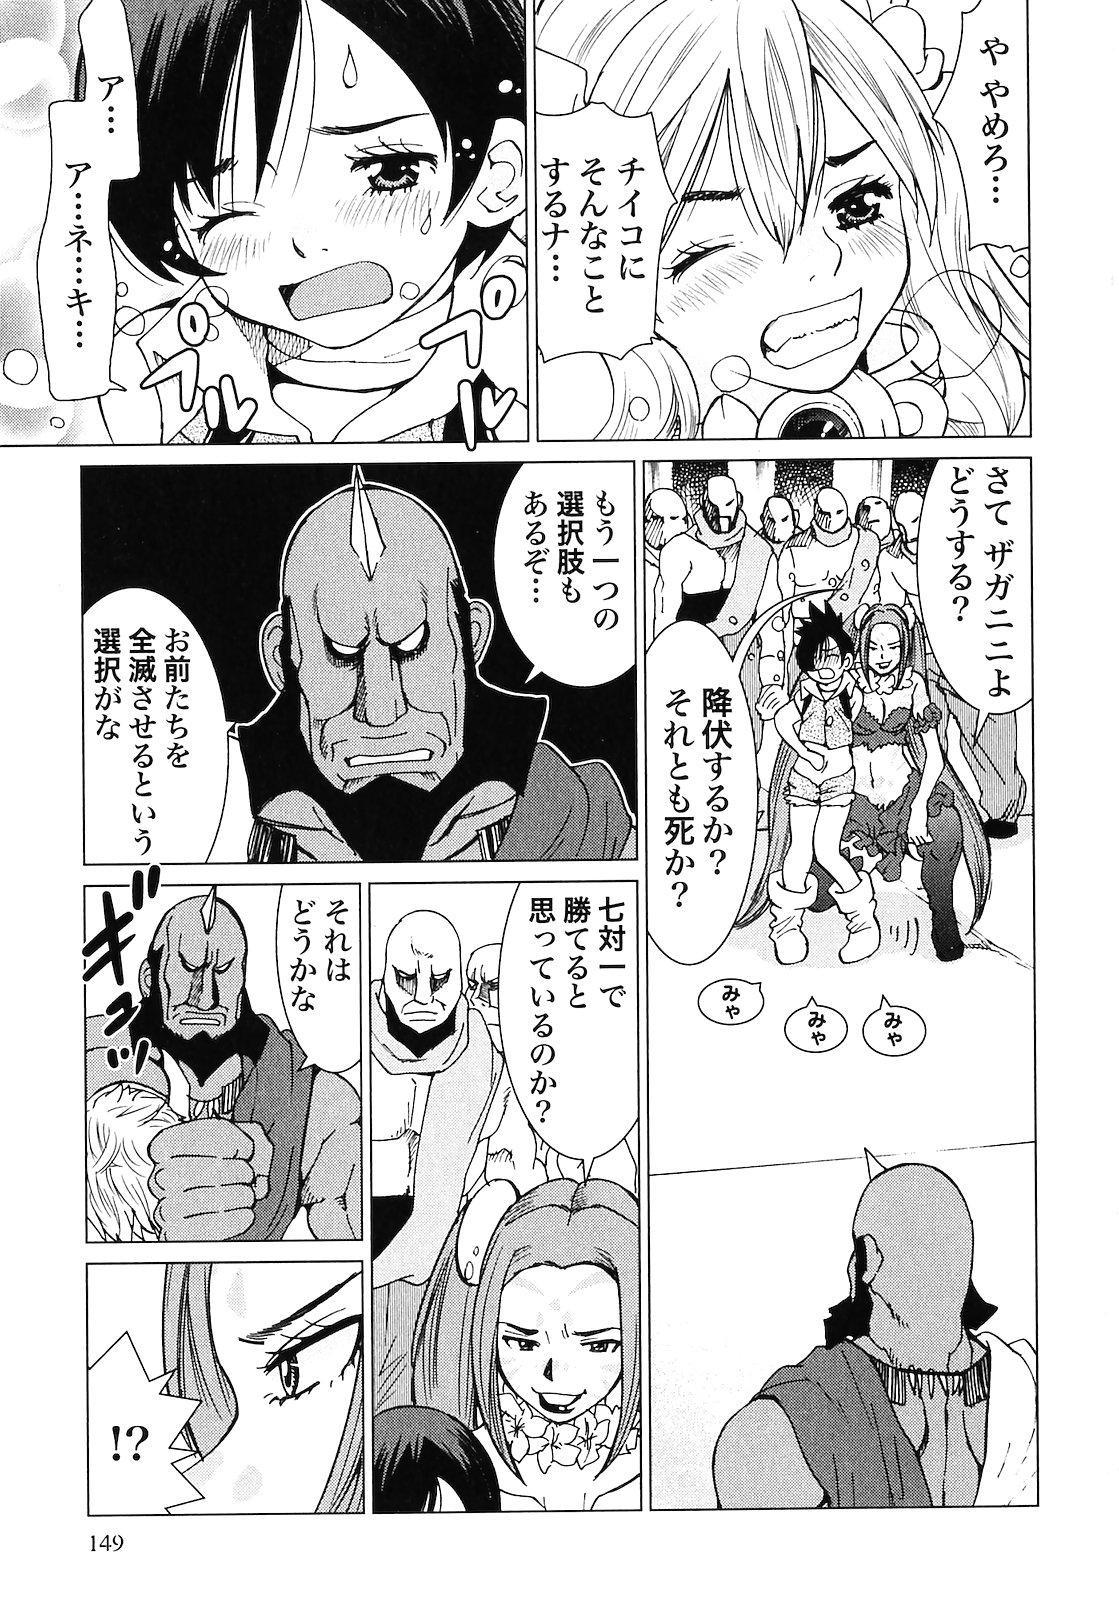 Makyo no Shanana Vol.02 150